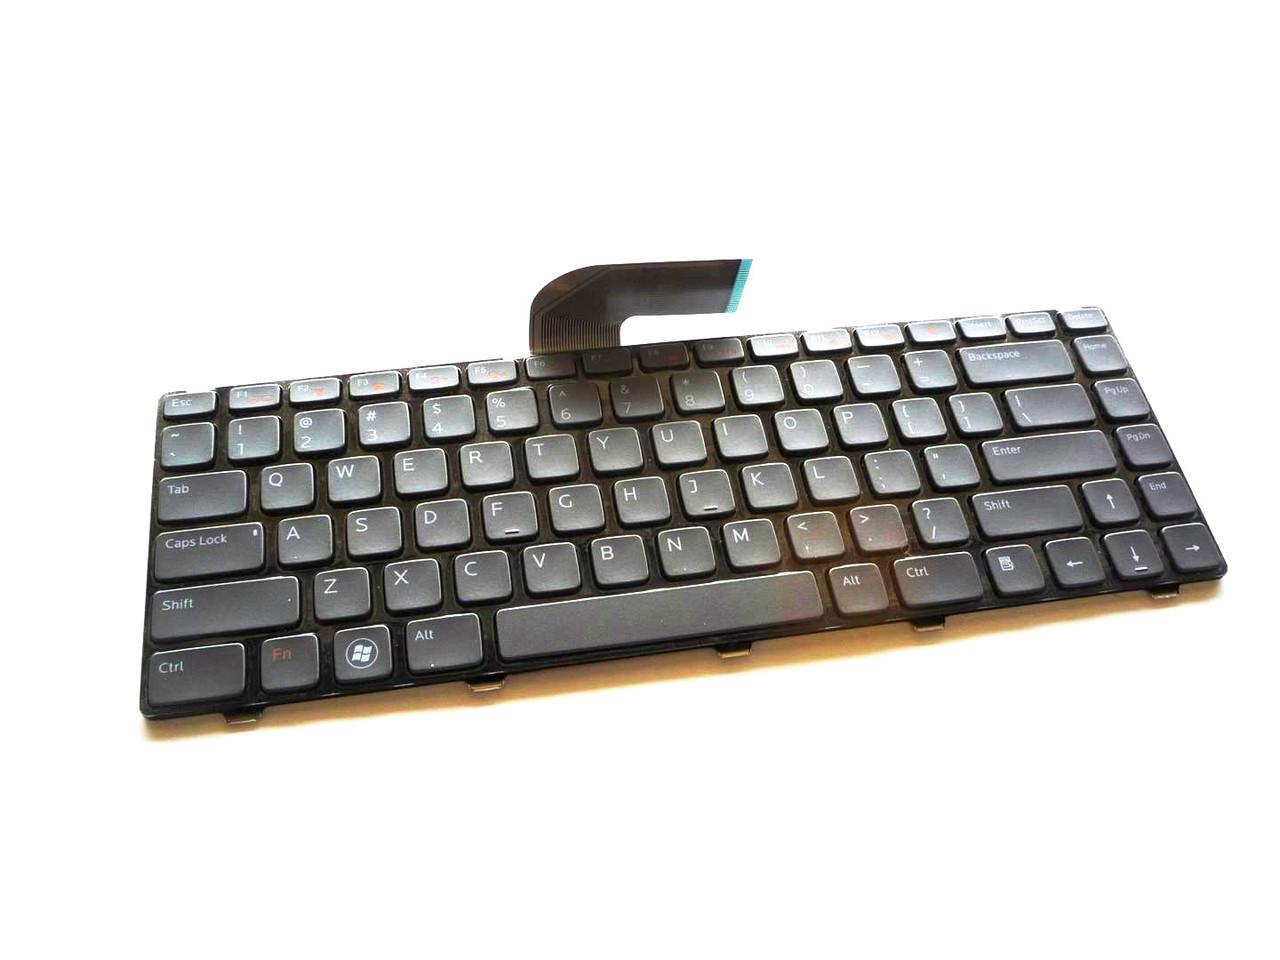 Dell Inspiron N411Z XPS L501X /L502X Vostro V131 Laptop Backlight Keyboard - PVDG3